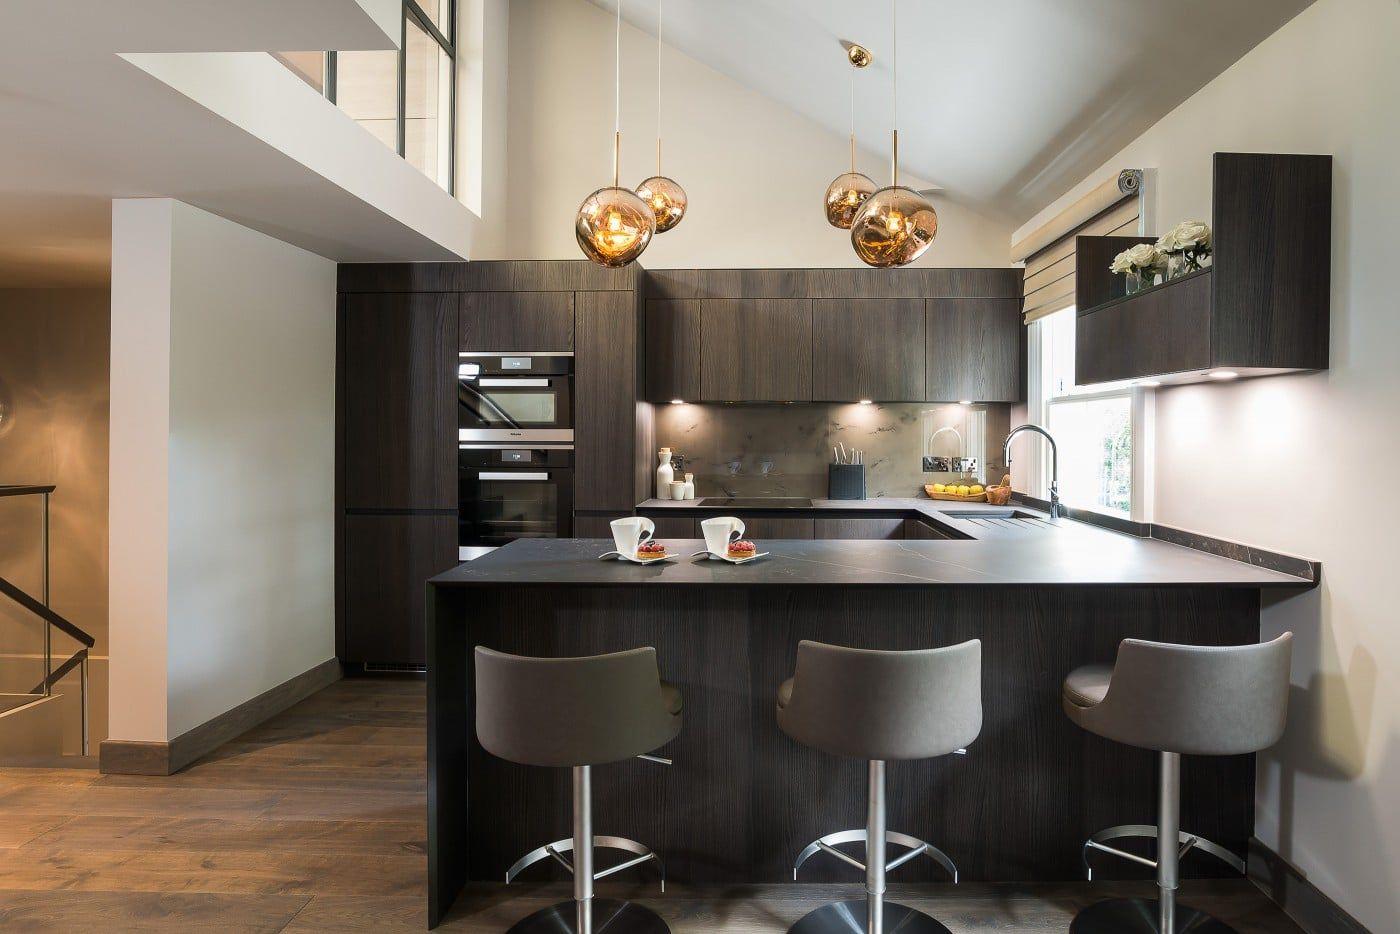 Stylish ushape kitchen in a London mews house by Elan